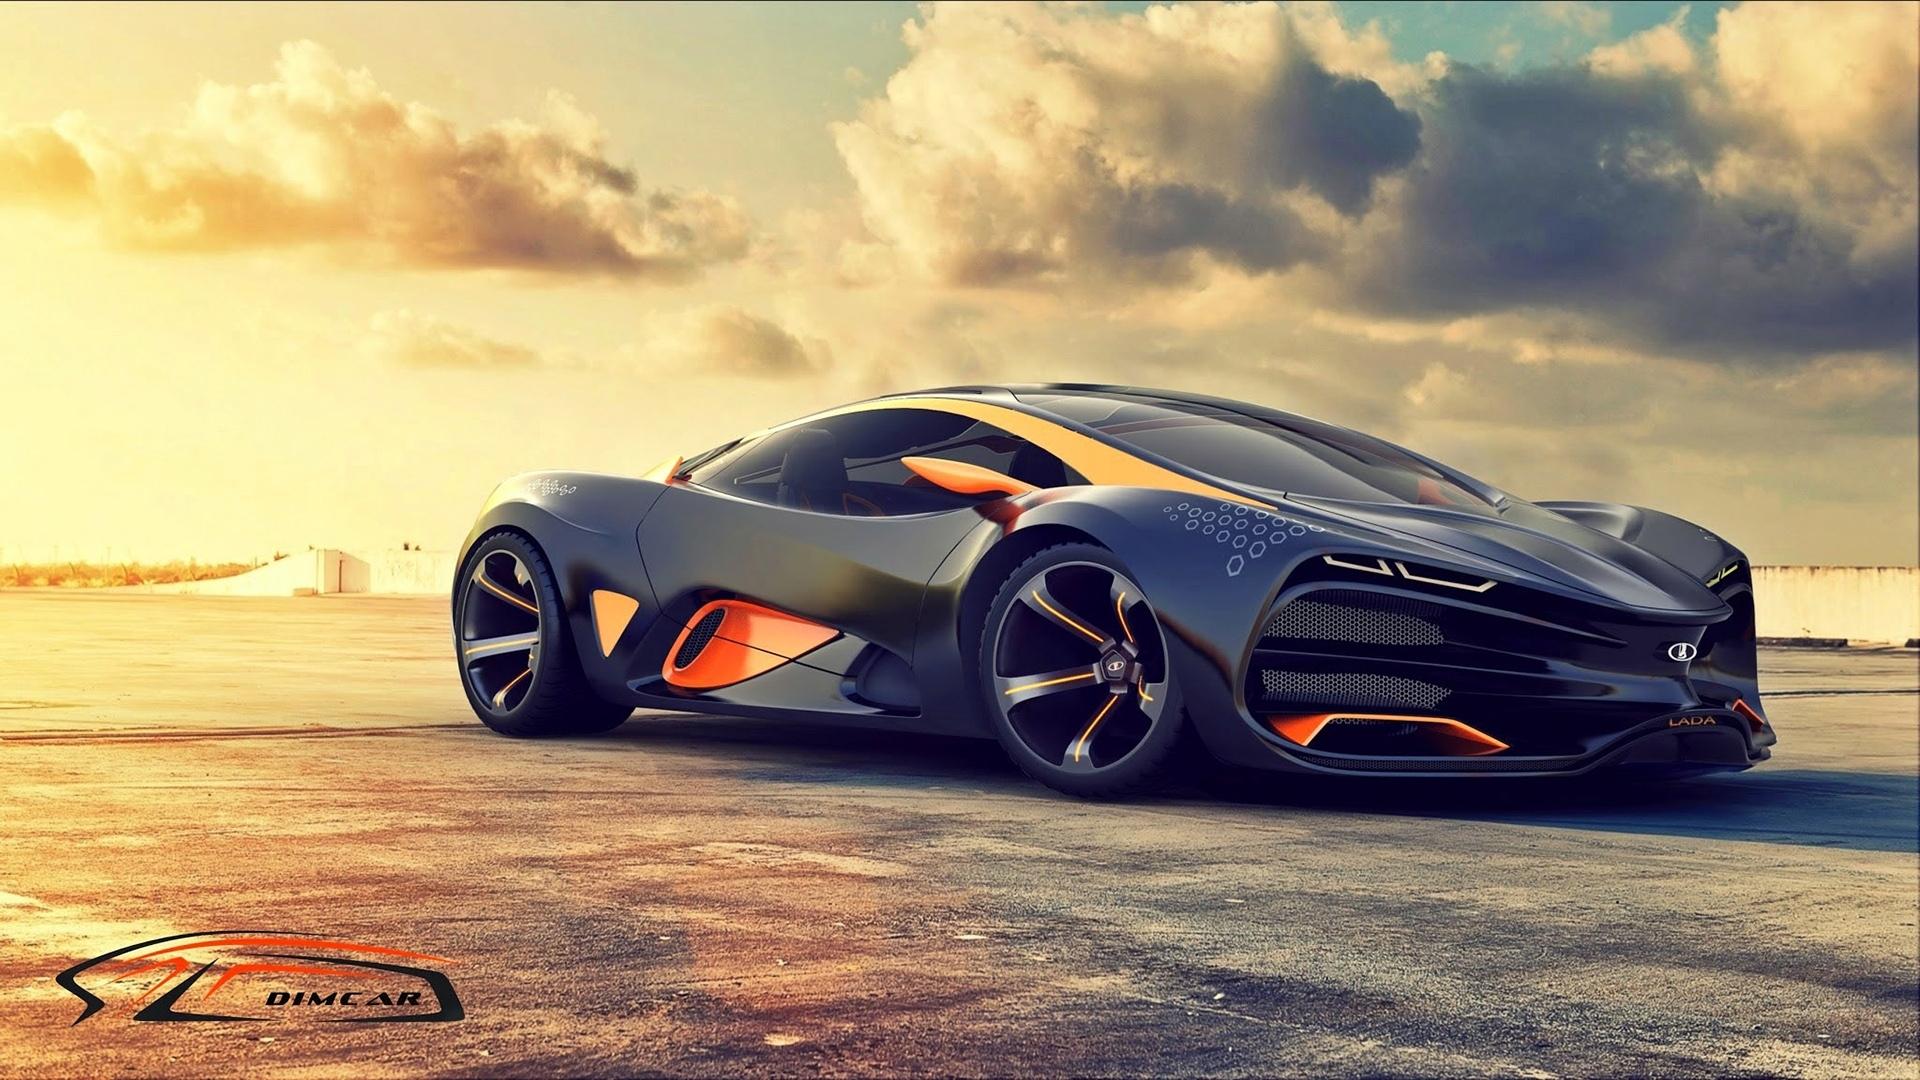 free super car full hd wallpaper images backgrounds supercar wide d